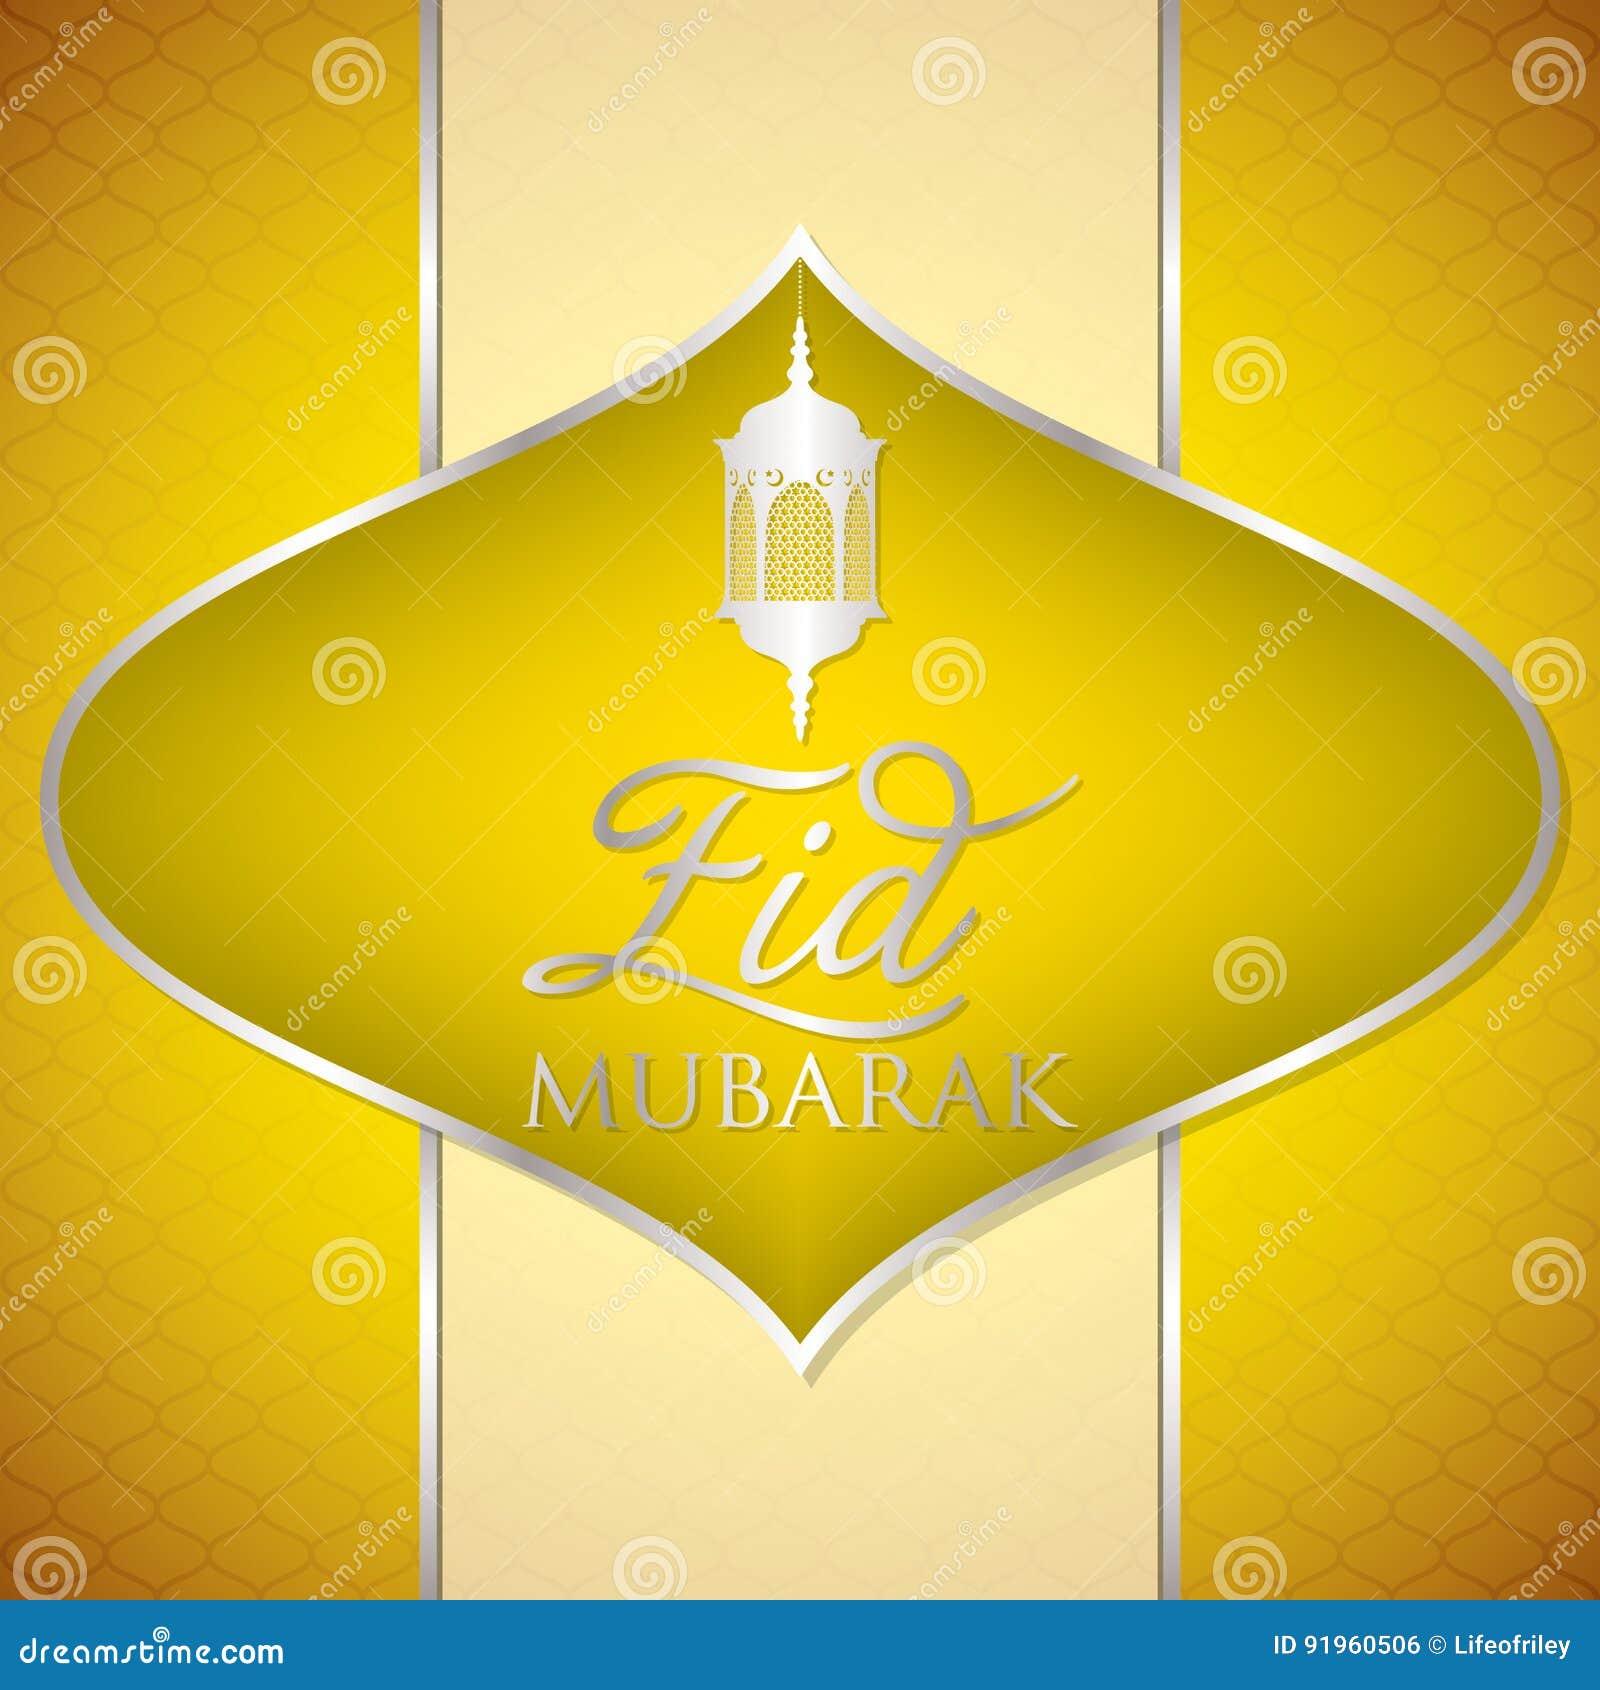 Eid mubarak blessed eid stock vector illustration of allah 91960506 eid mubarak blessed eid allah adha kristyandbryce Image collections